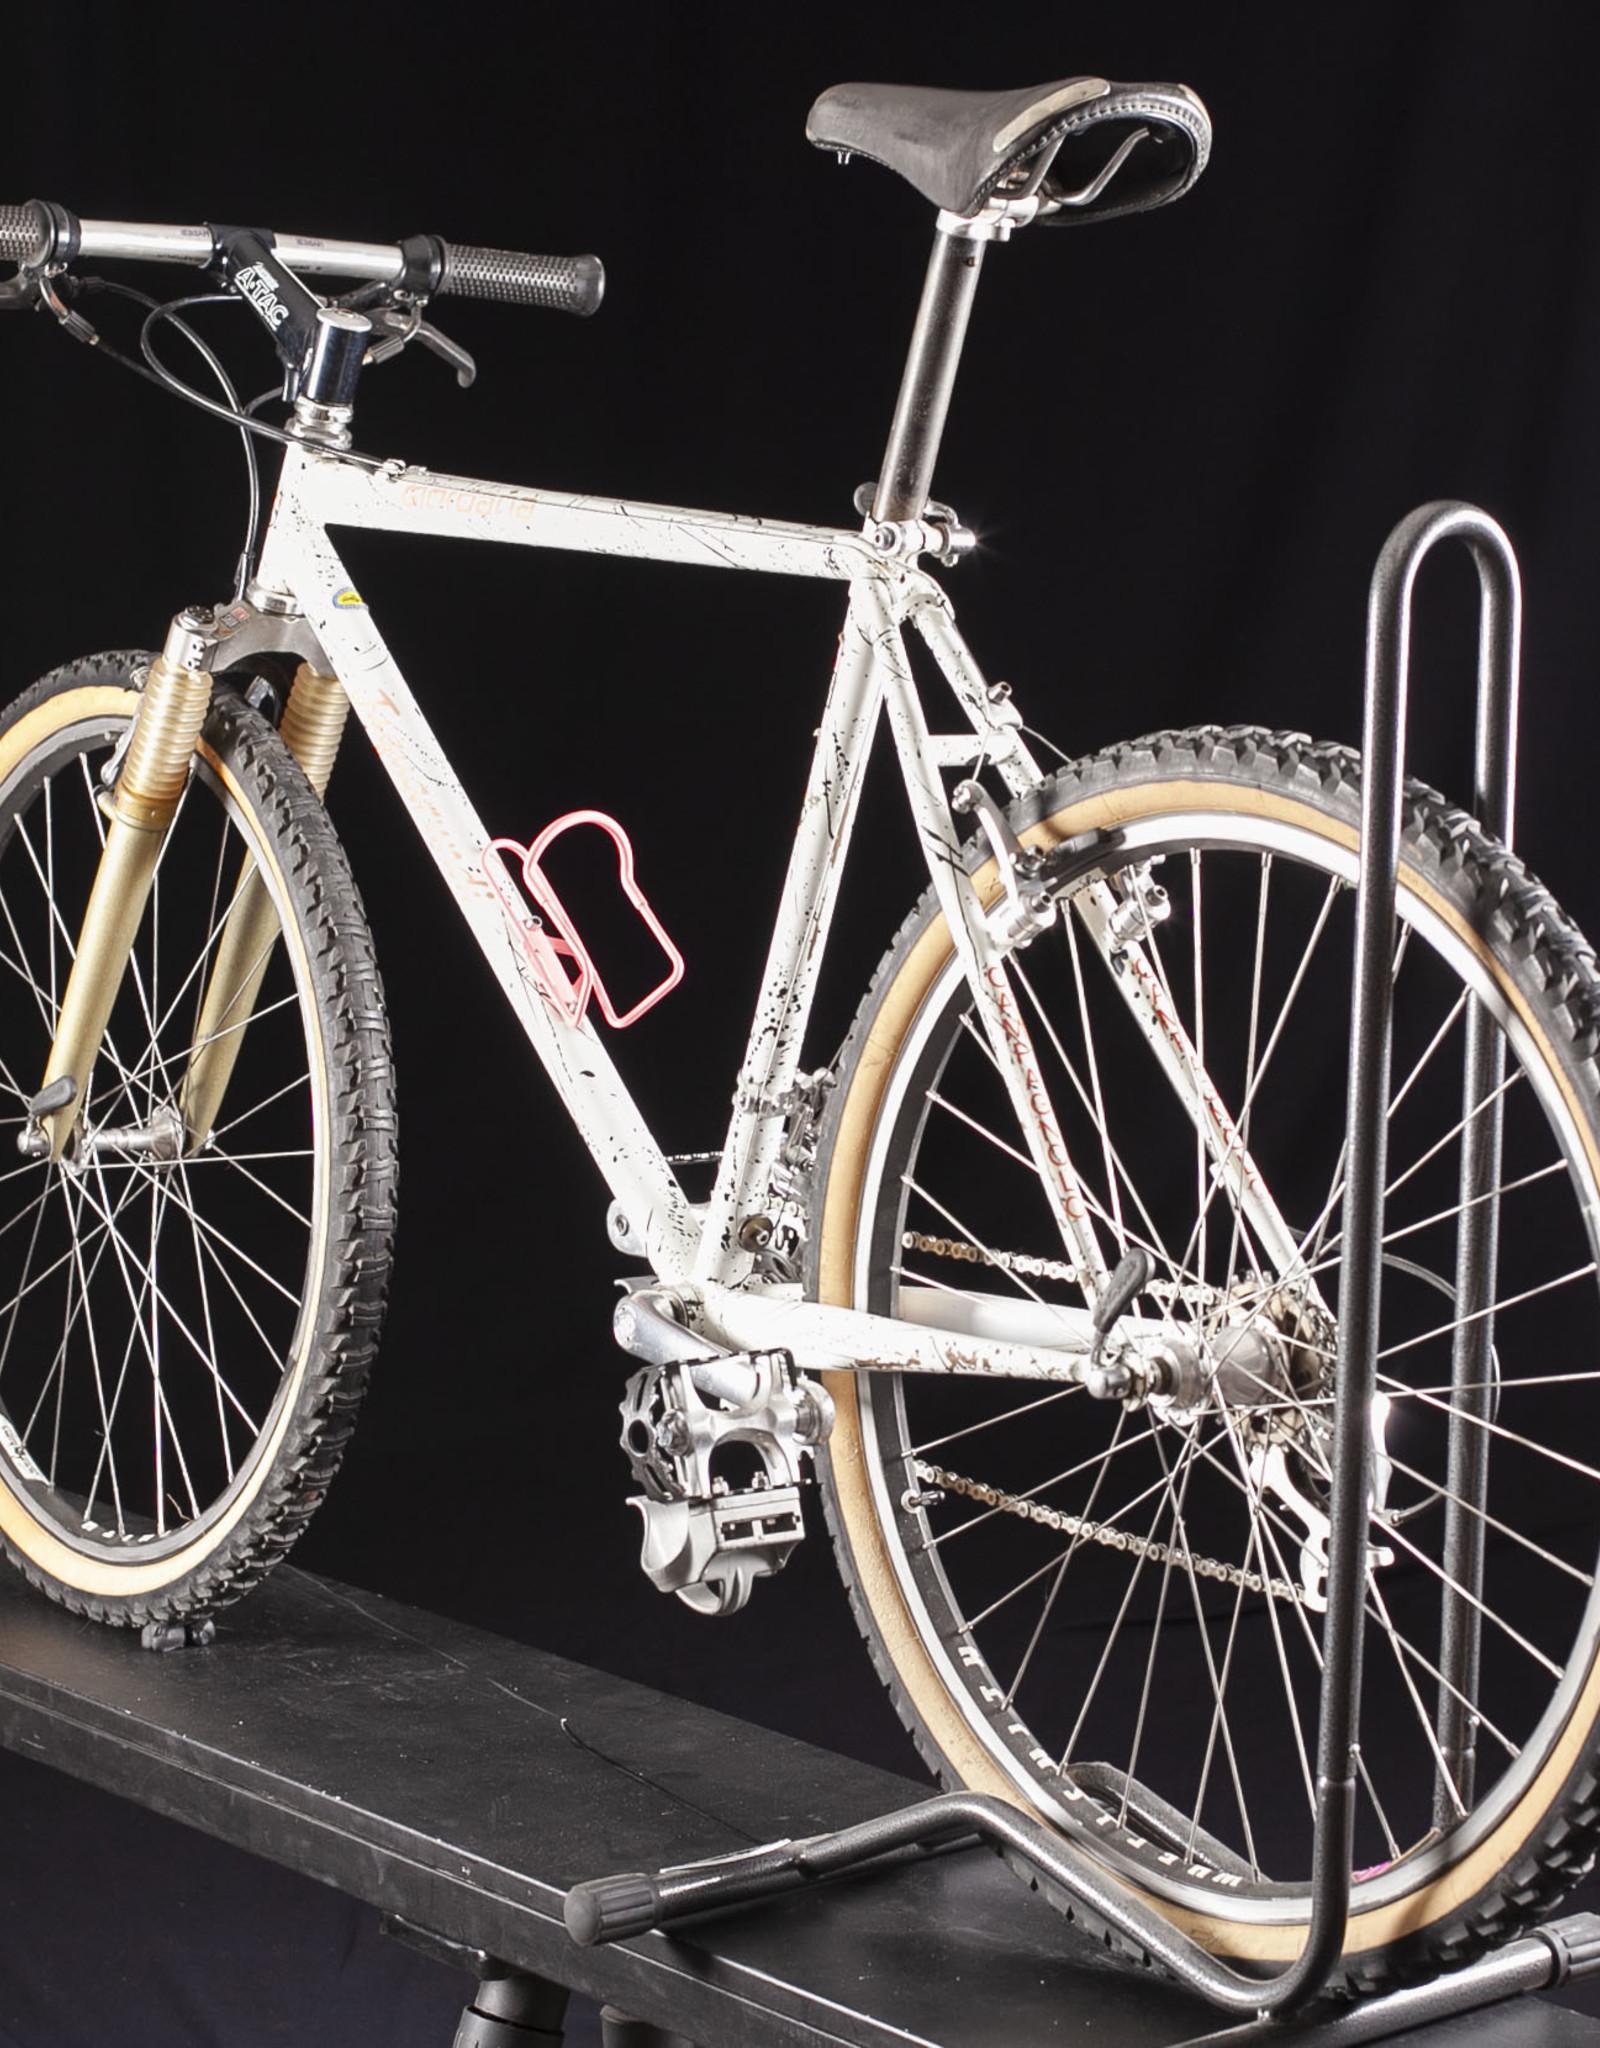 Vintage Giordana Jagarundi Mountain Bike, medium size, circa 1992 Campagnolo OR